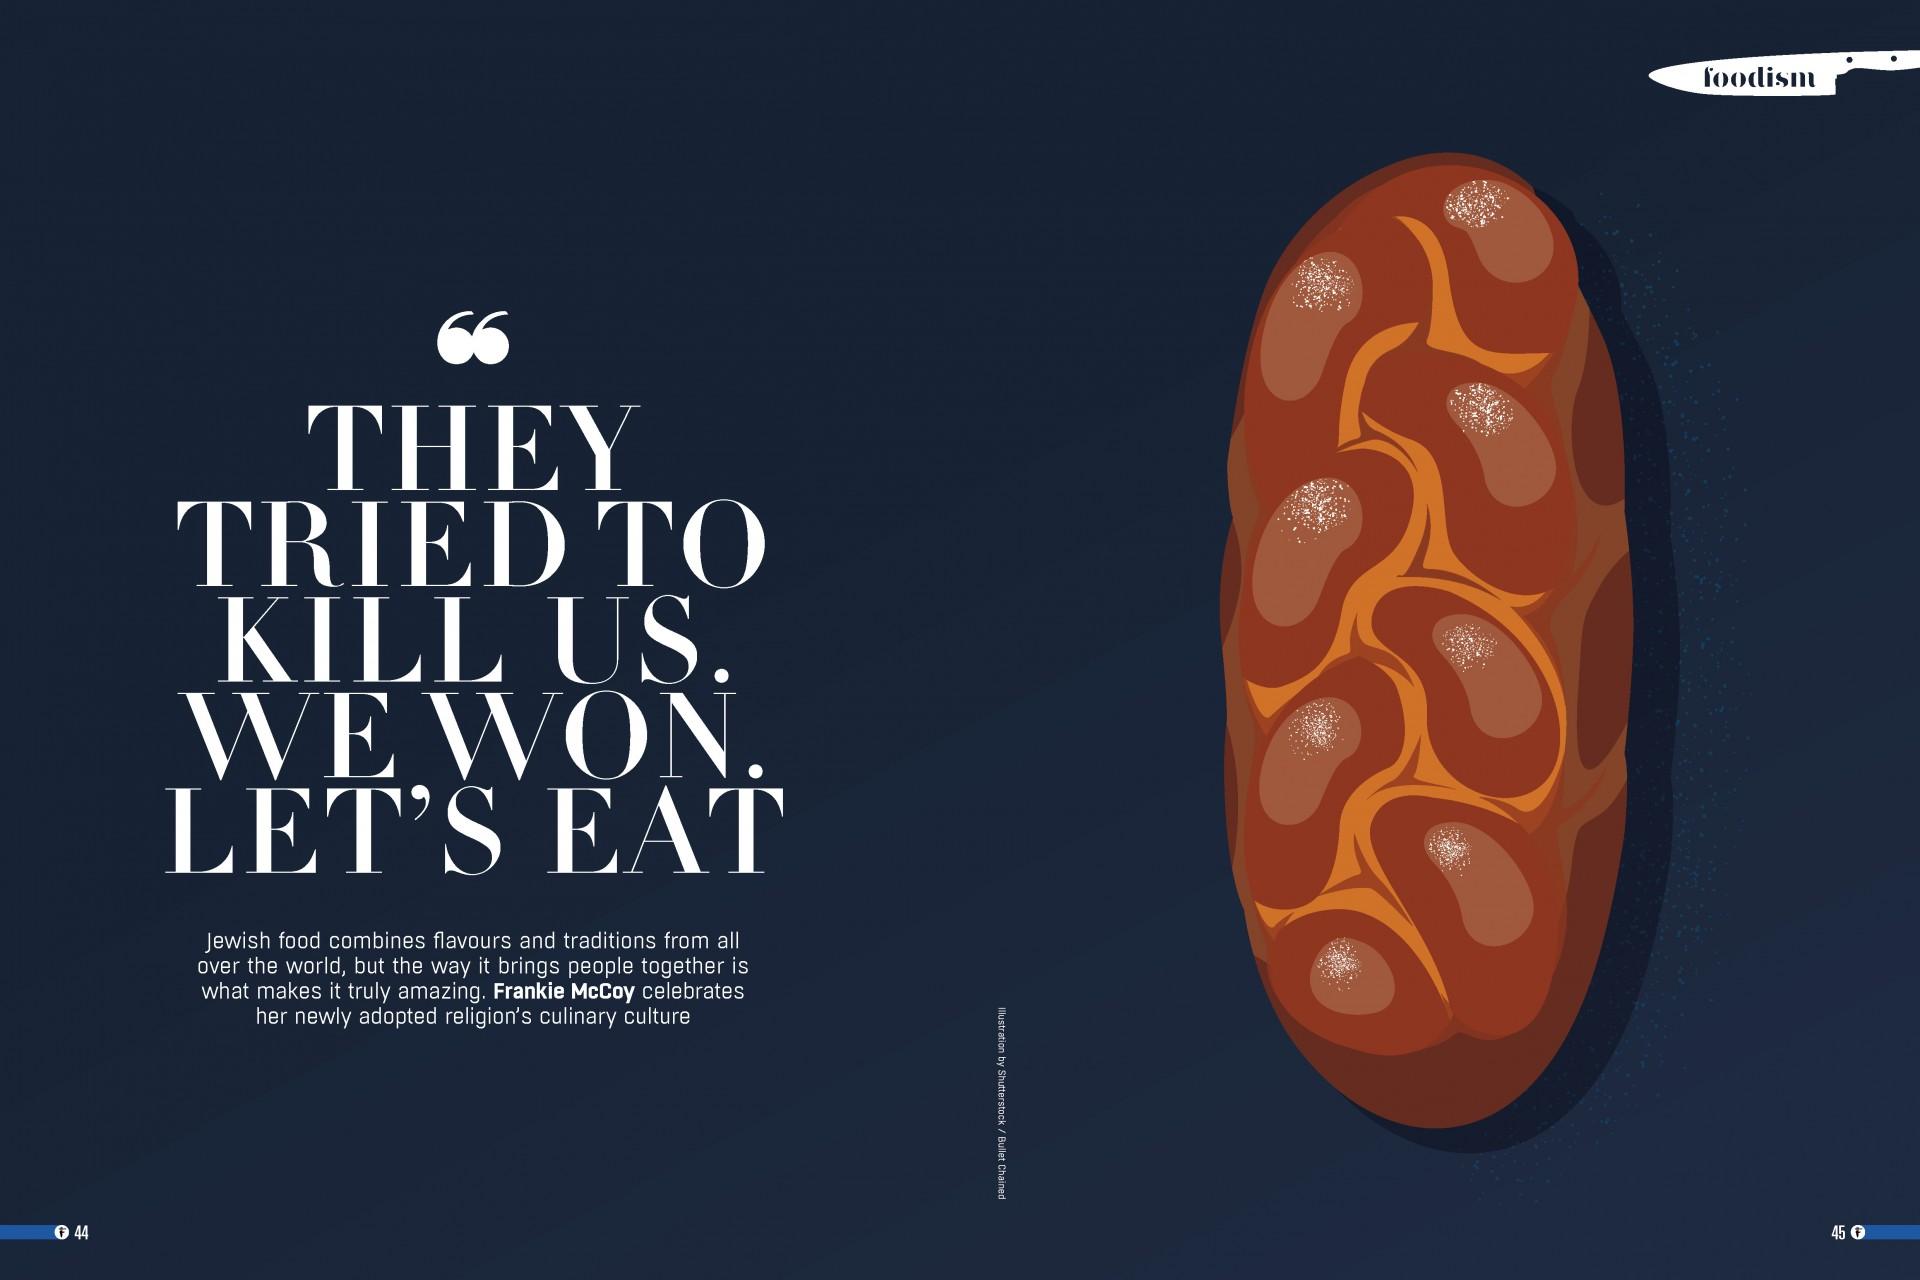 Foodism issue 36: Jewish food